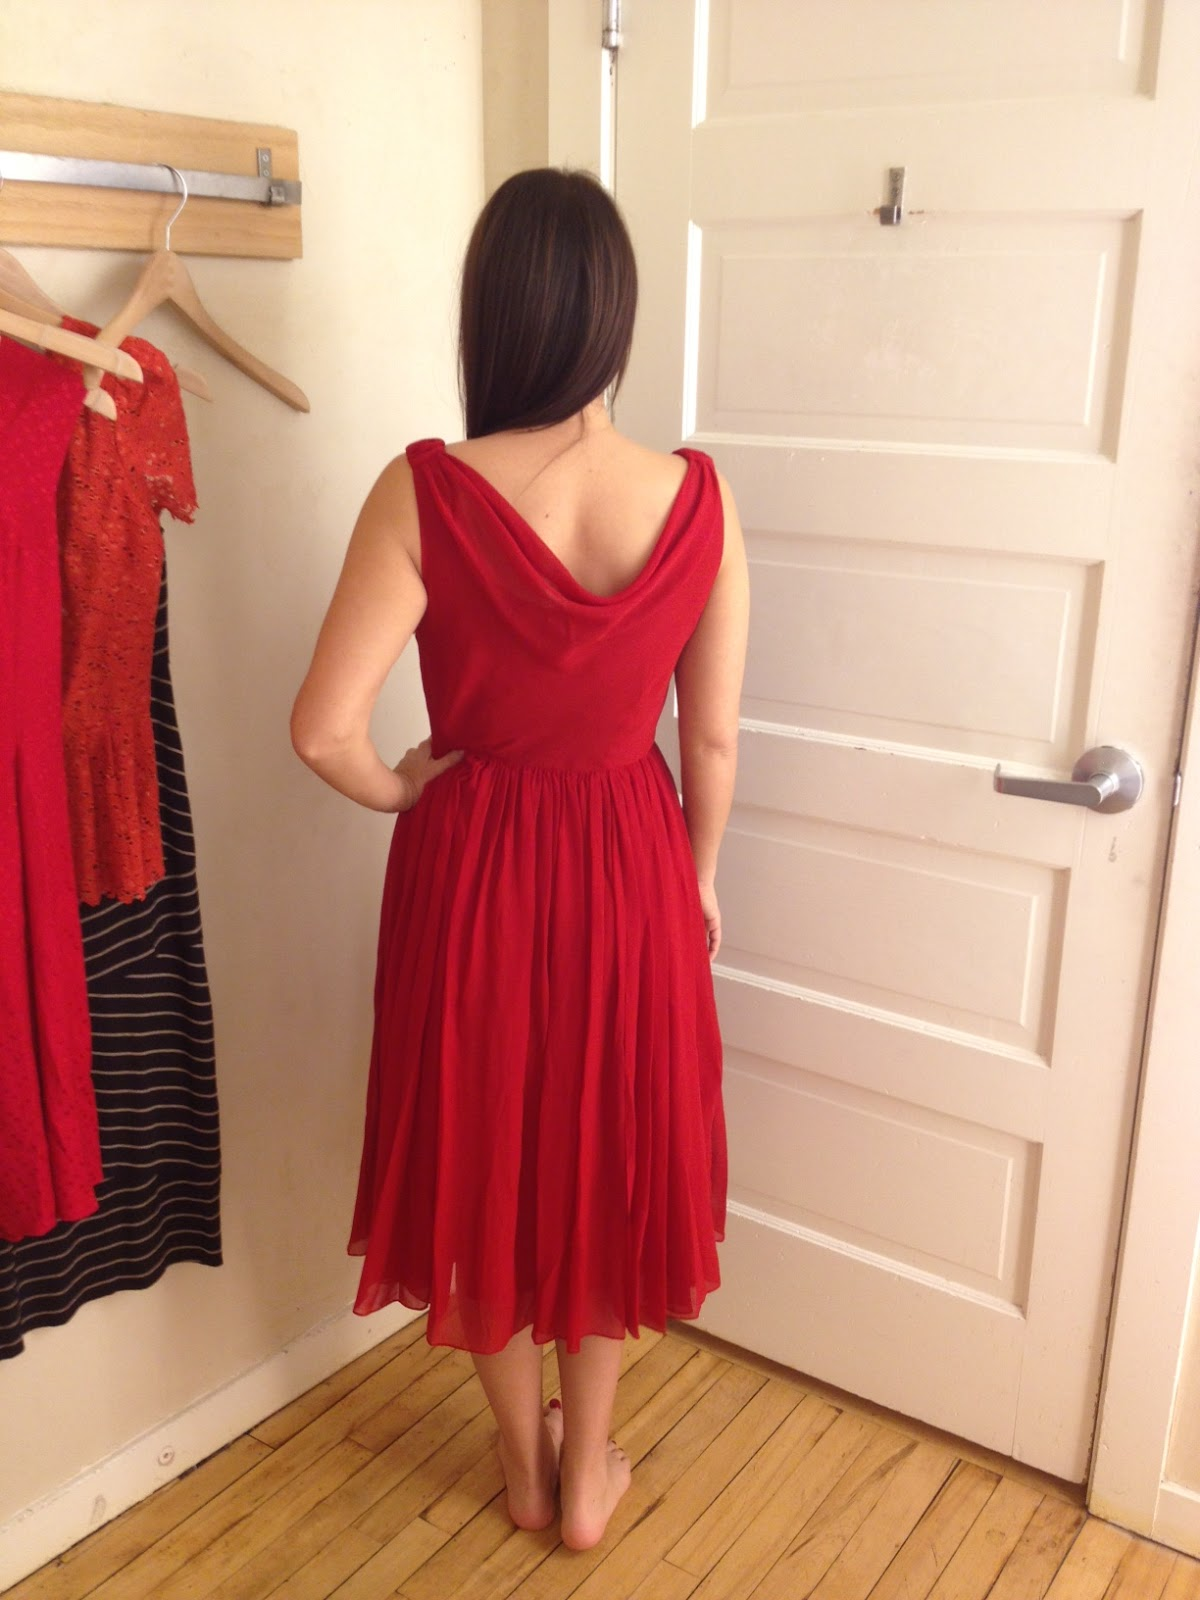 Moulinette Soeurs Gracia Dress Style 23277072 Color Red 060 Price 248 Length Regular 42 25 Pee 40 Pros Ruched Neckline